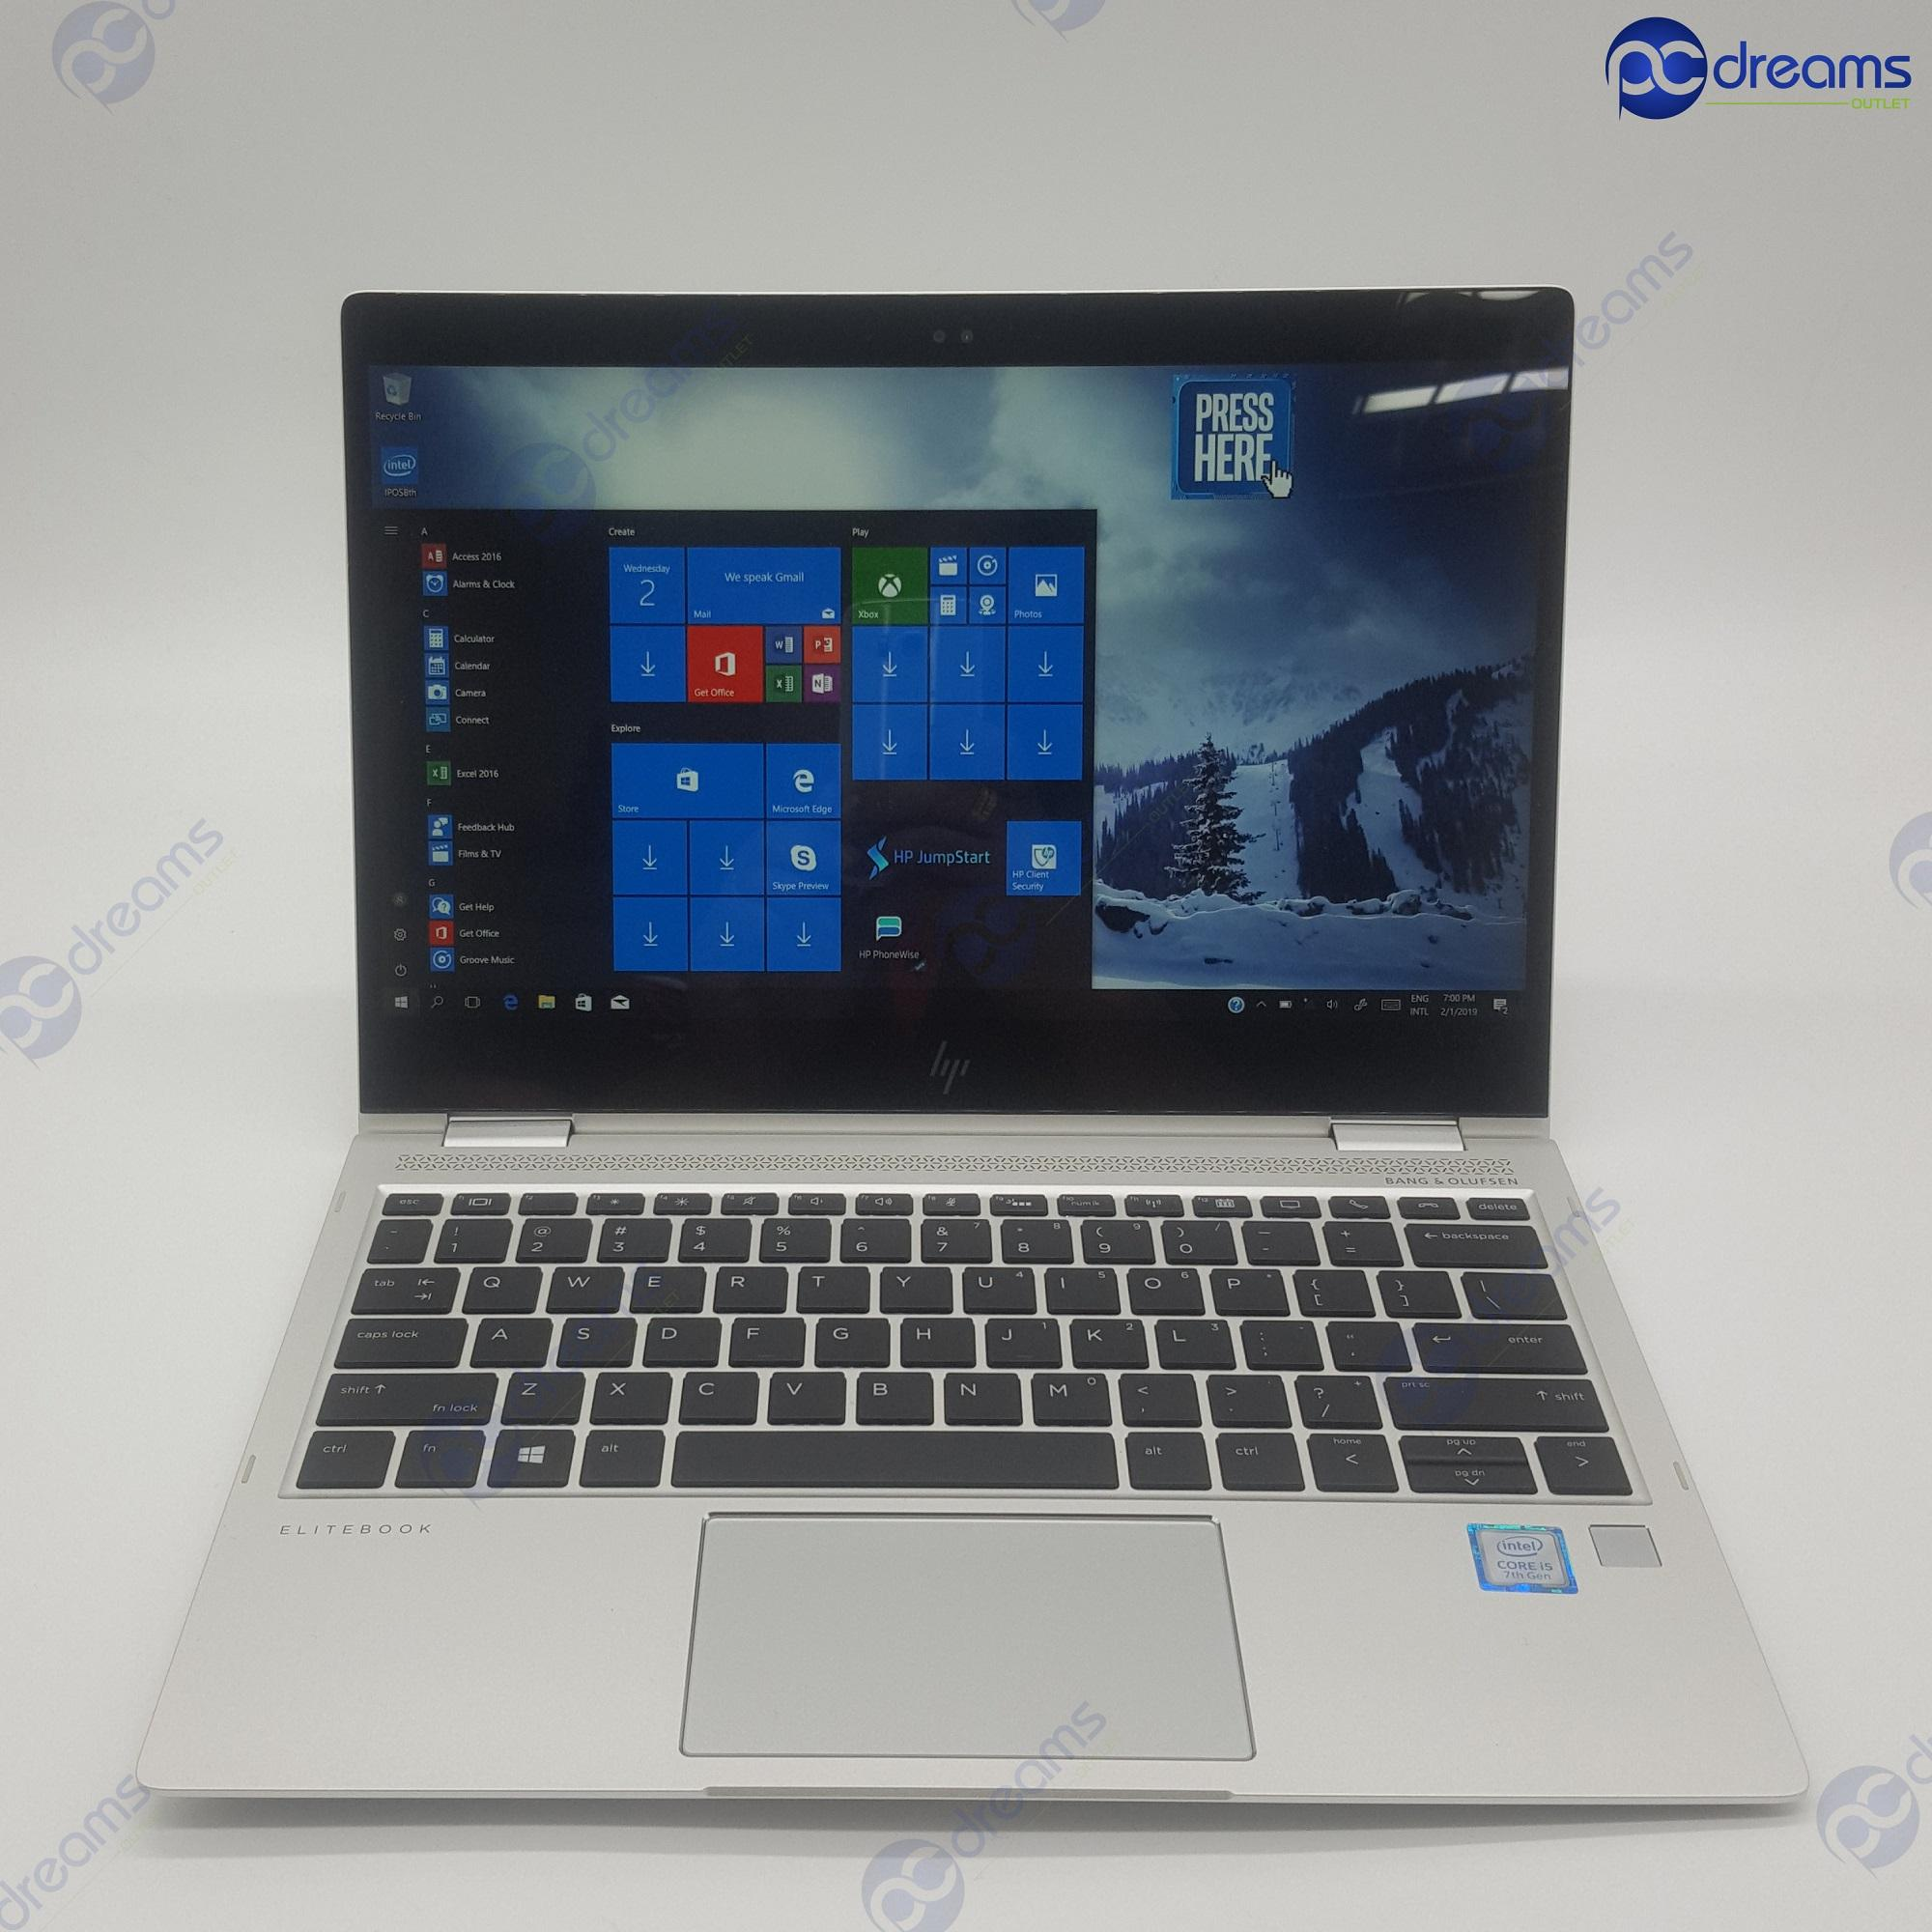 HP ELITEBOOK X360 1020 G2 (1EJ34AV) i5-7300U/16GB/256GB PCIe SSD [Premium Refreshed]